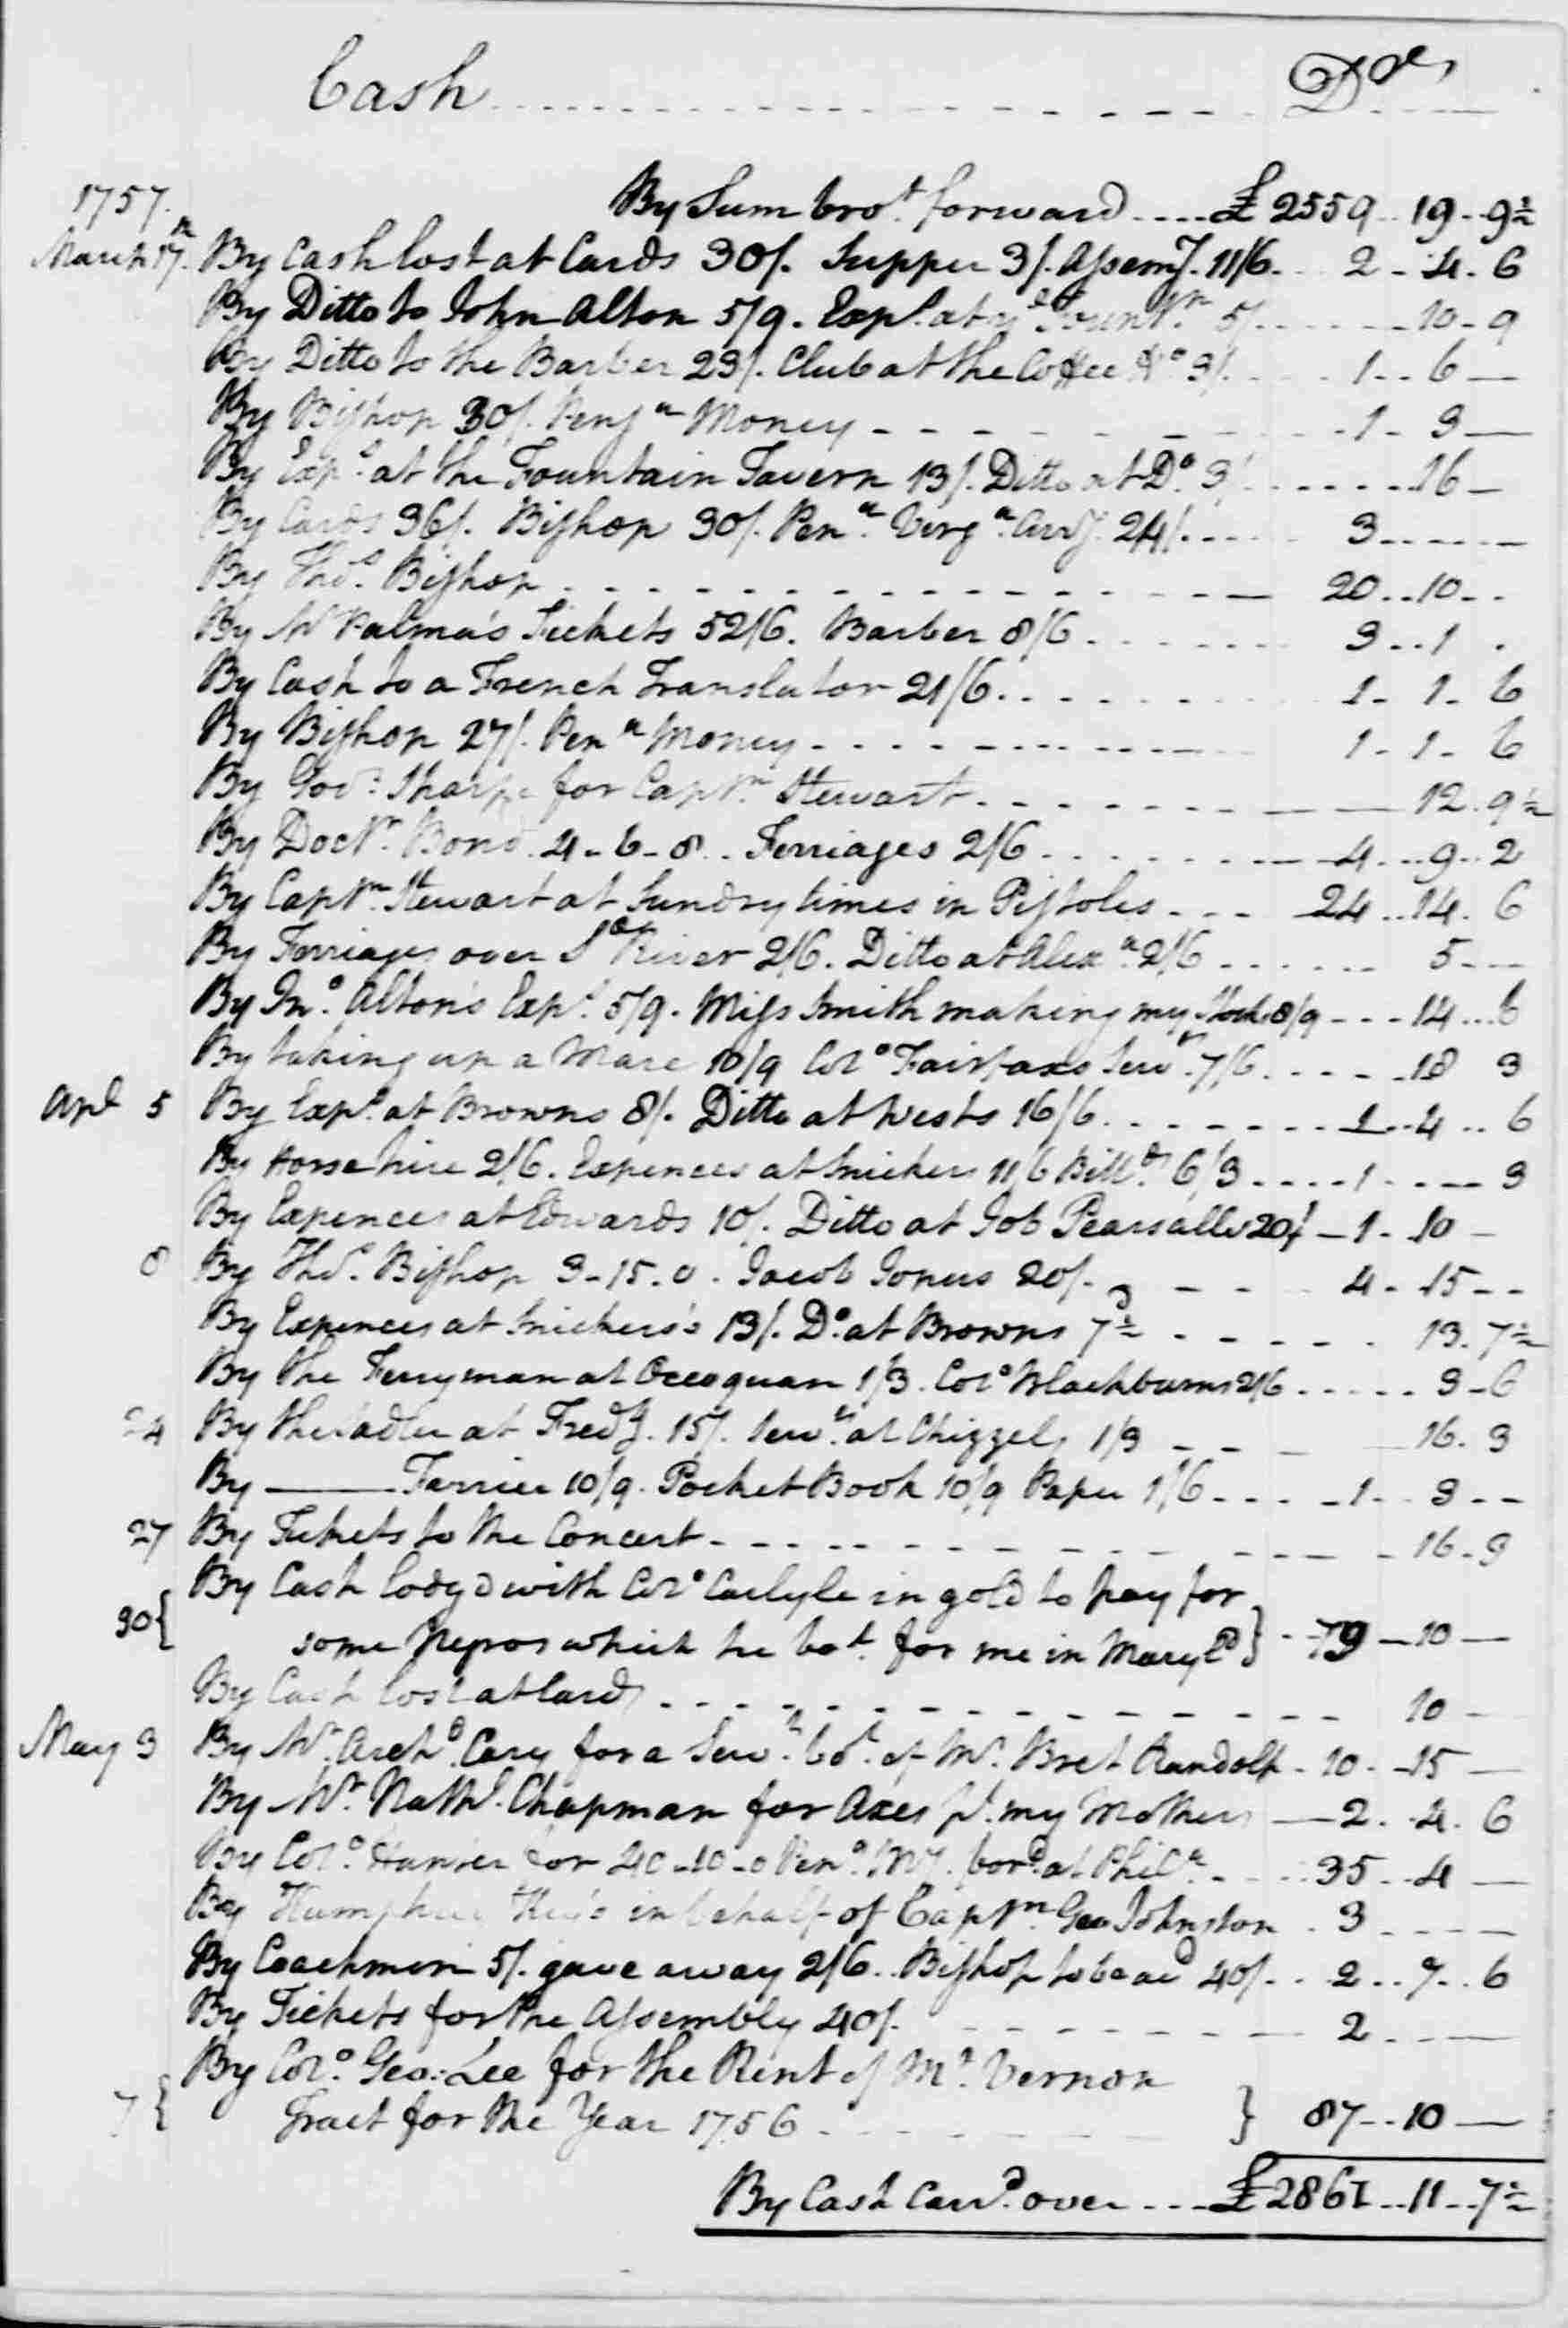 Ledger A, folio 34, right side